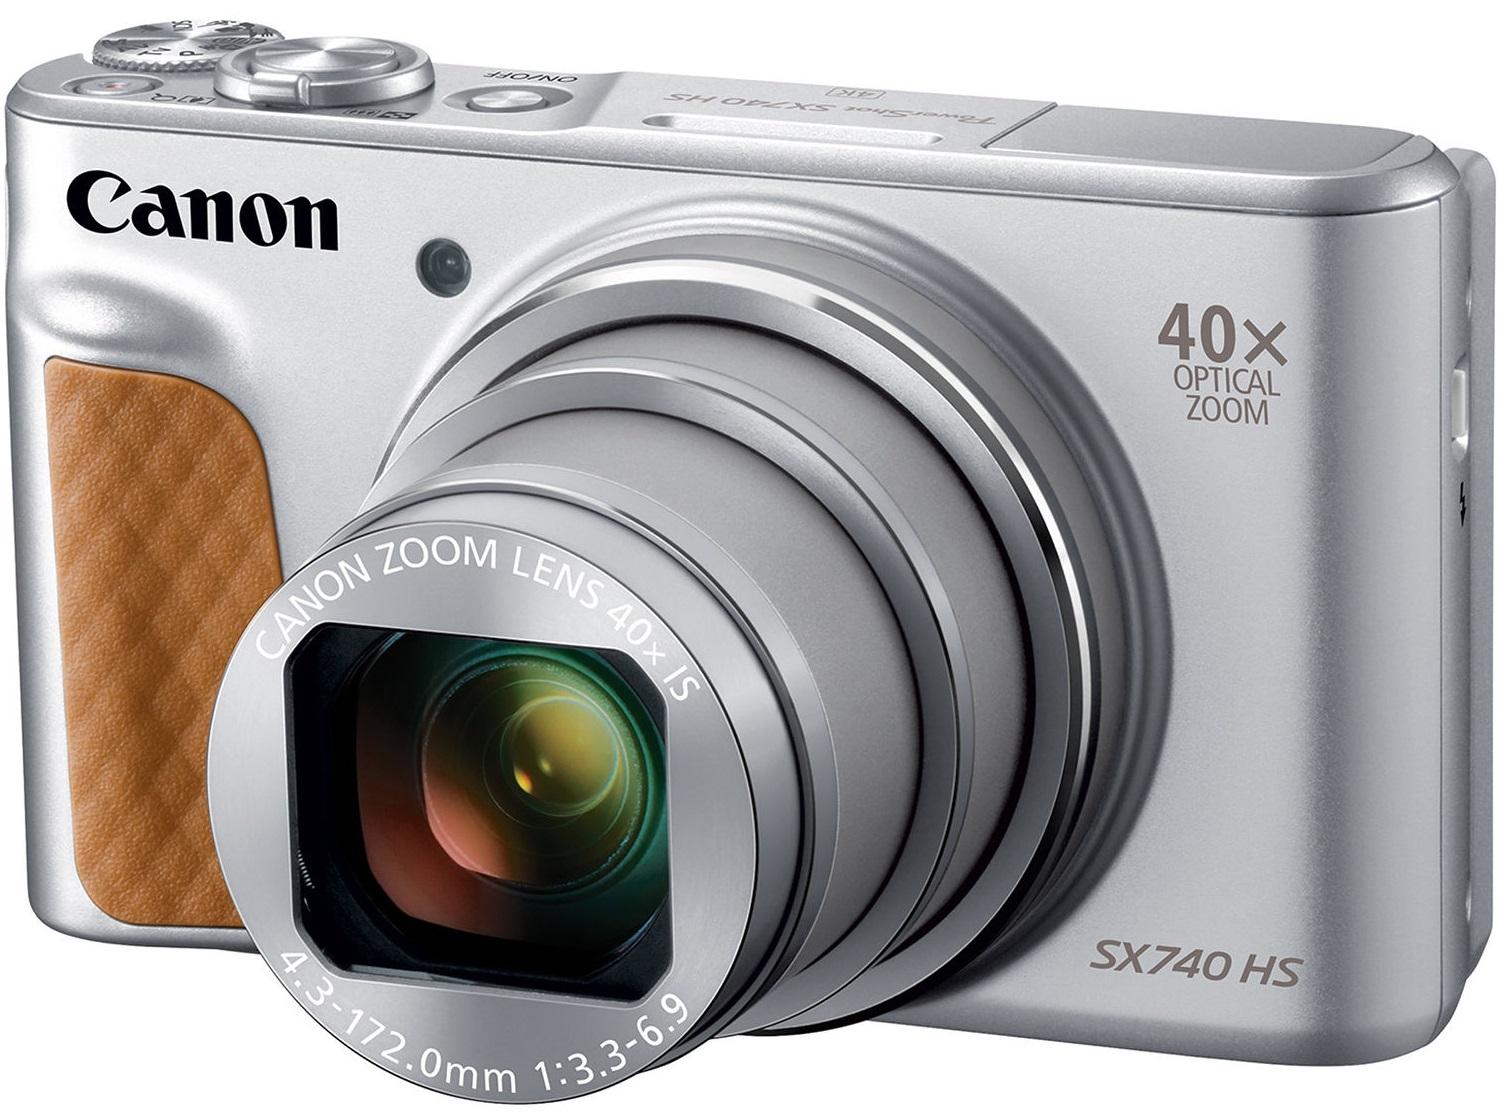 CANON PowerShot SX740 HS stříbrný